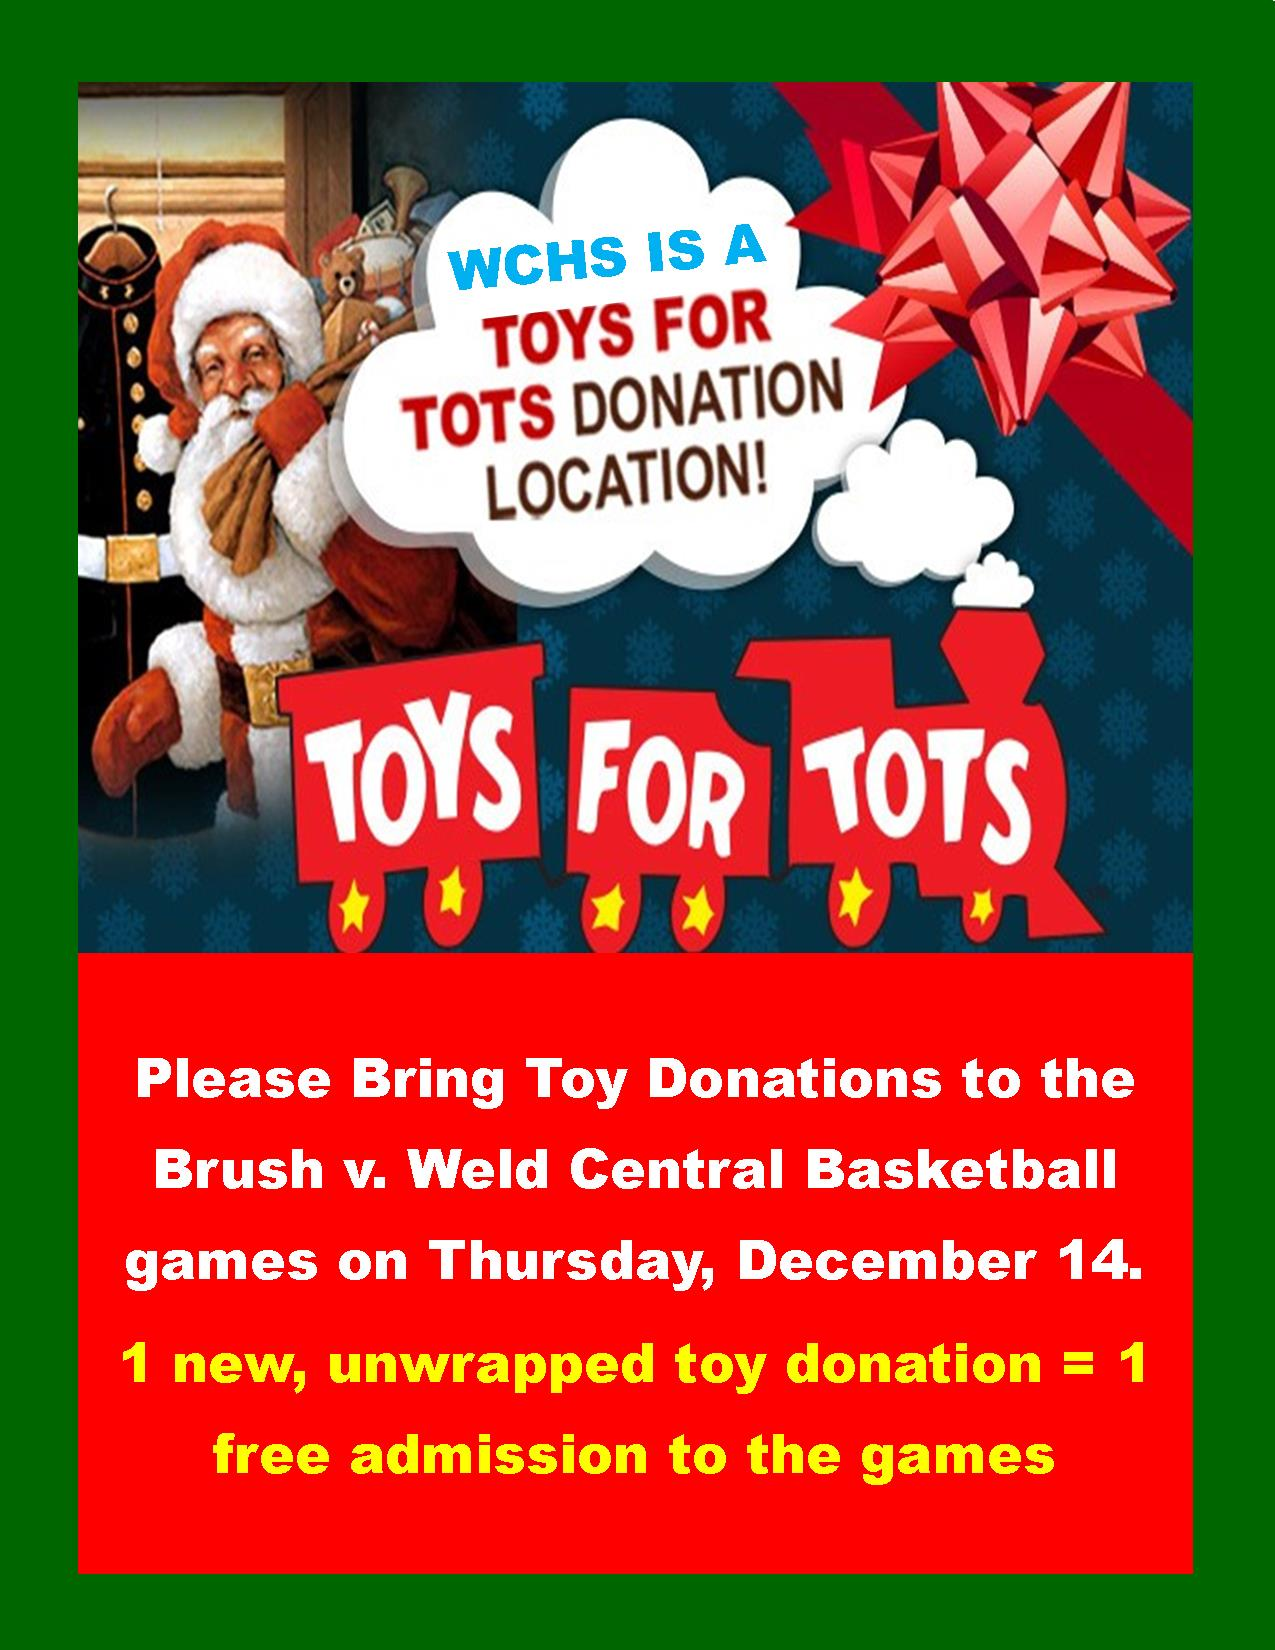 Toys for Tots at Brush v. Weld Central Basketball Games